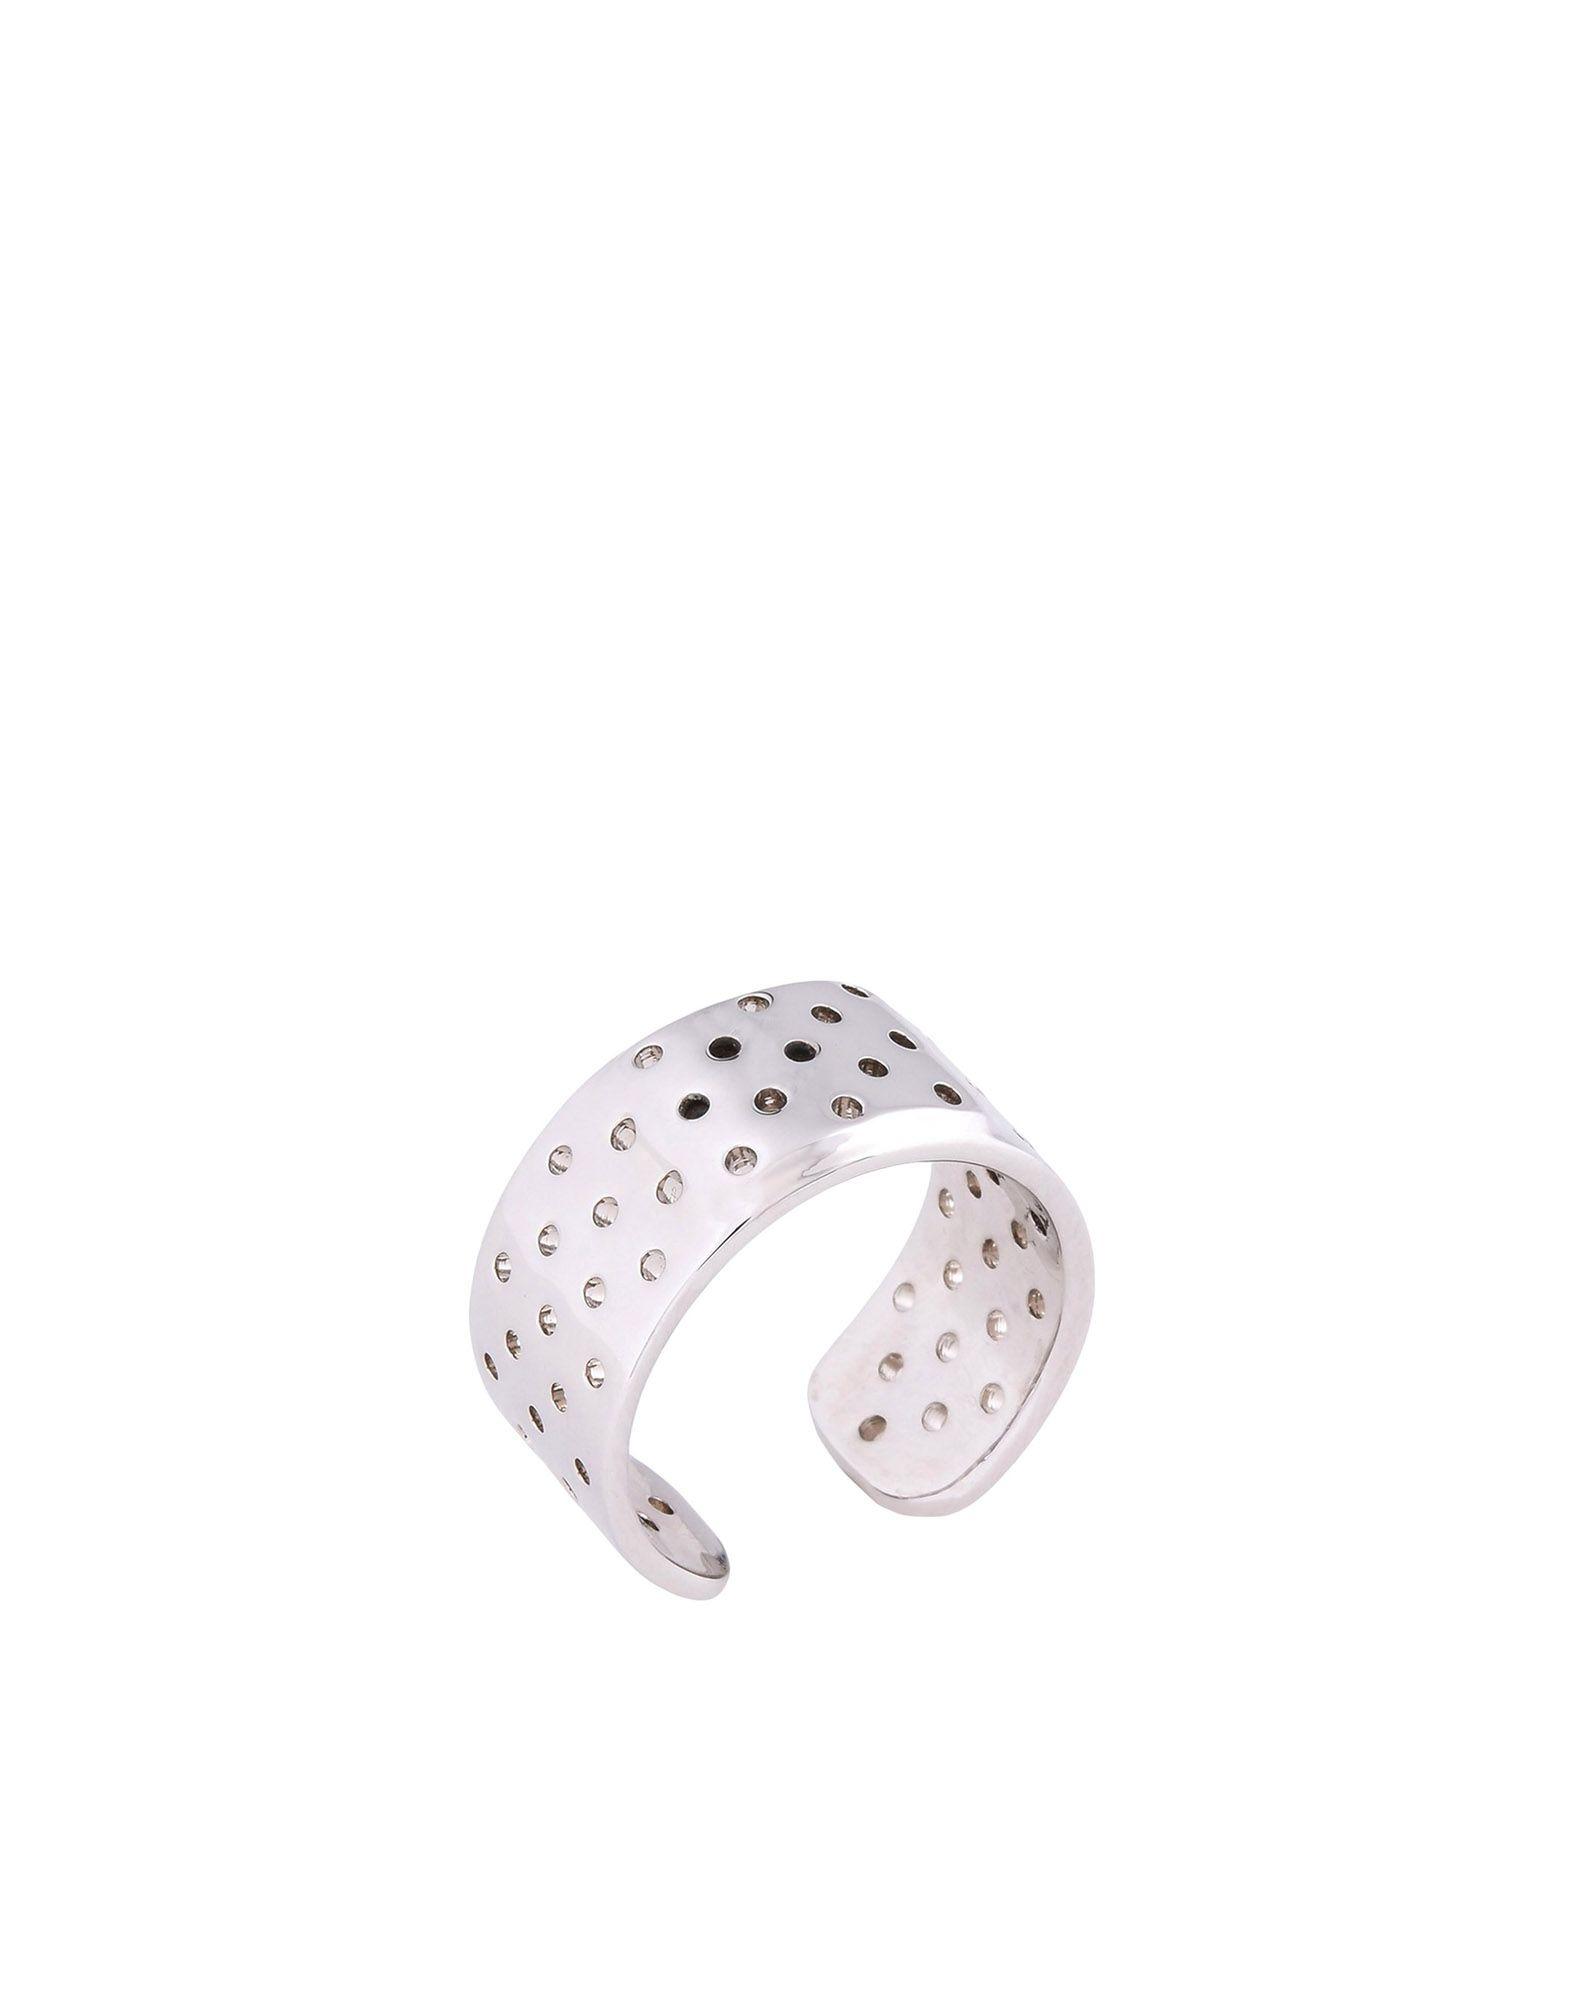 Anello Schield Little Plaster Ring - Donna - Acquista online su